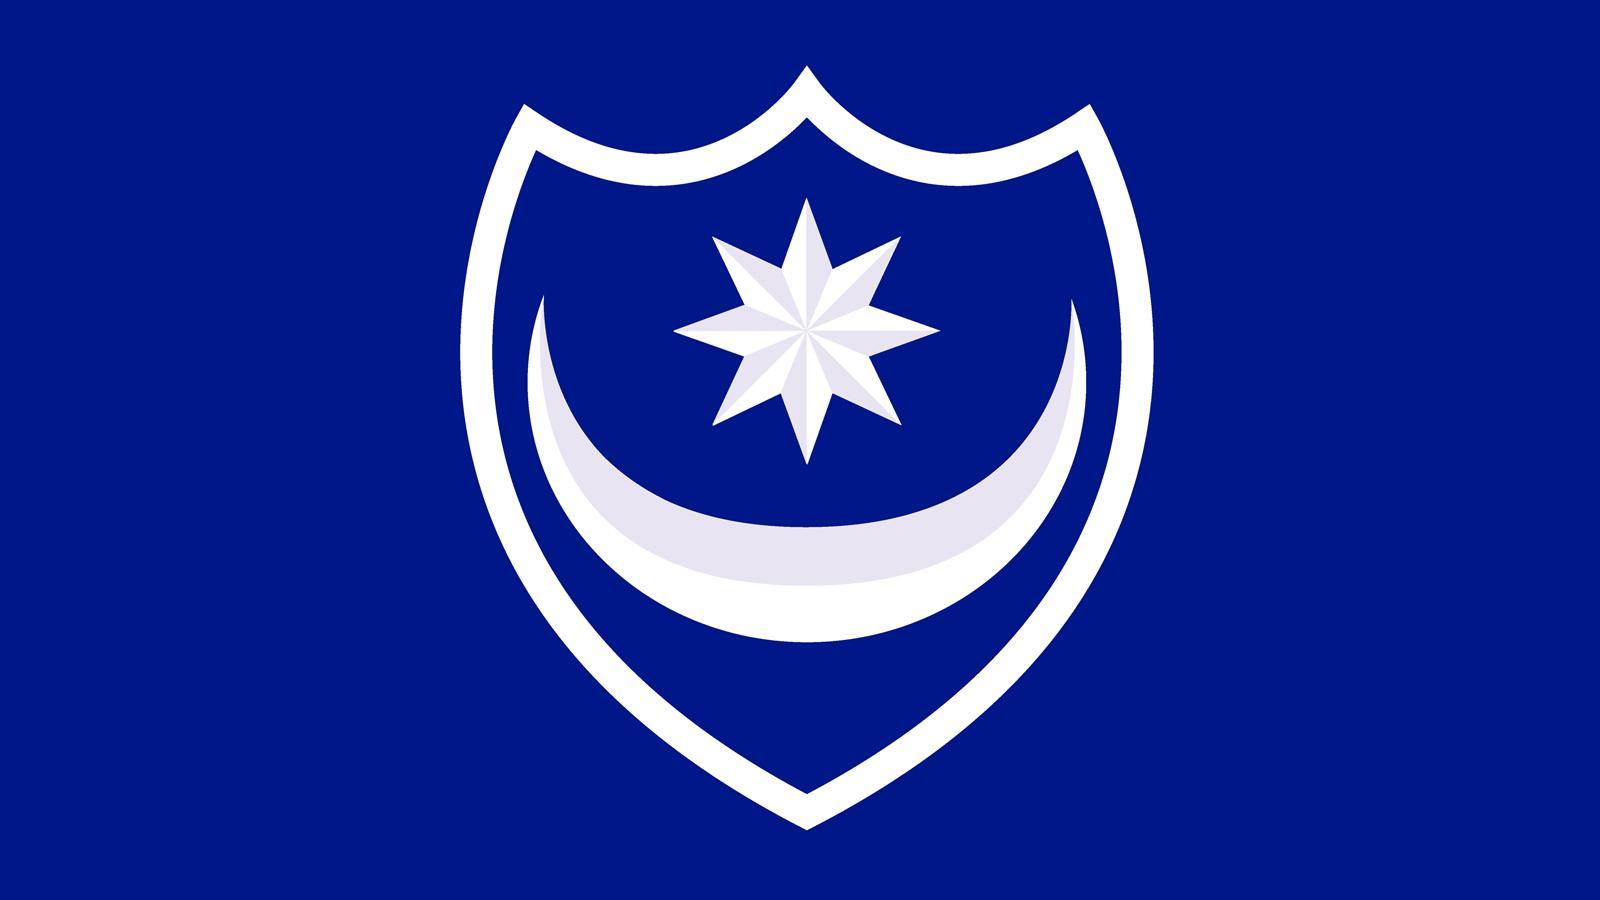 http://2.bp.blogspot.com/-EsTScNiTbYc/VDhbfHTJ3GI/AAAAAAAAZGQ/K8IHOeYofTU/s1600/New-Portsmouth-FC-2015-Crest.jpg